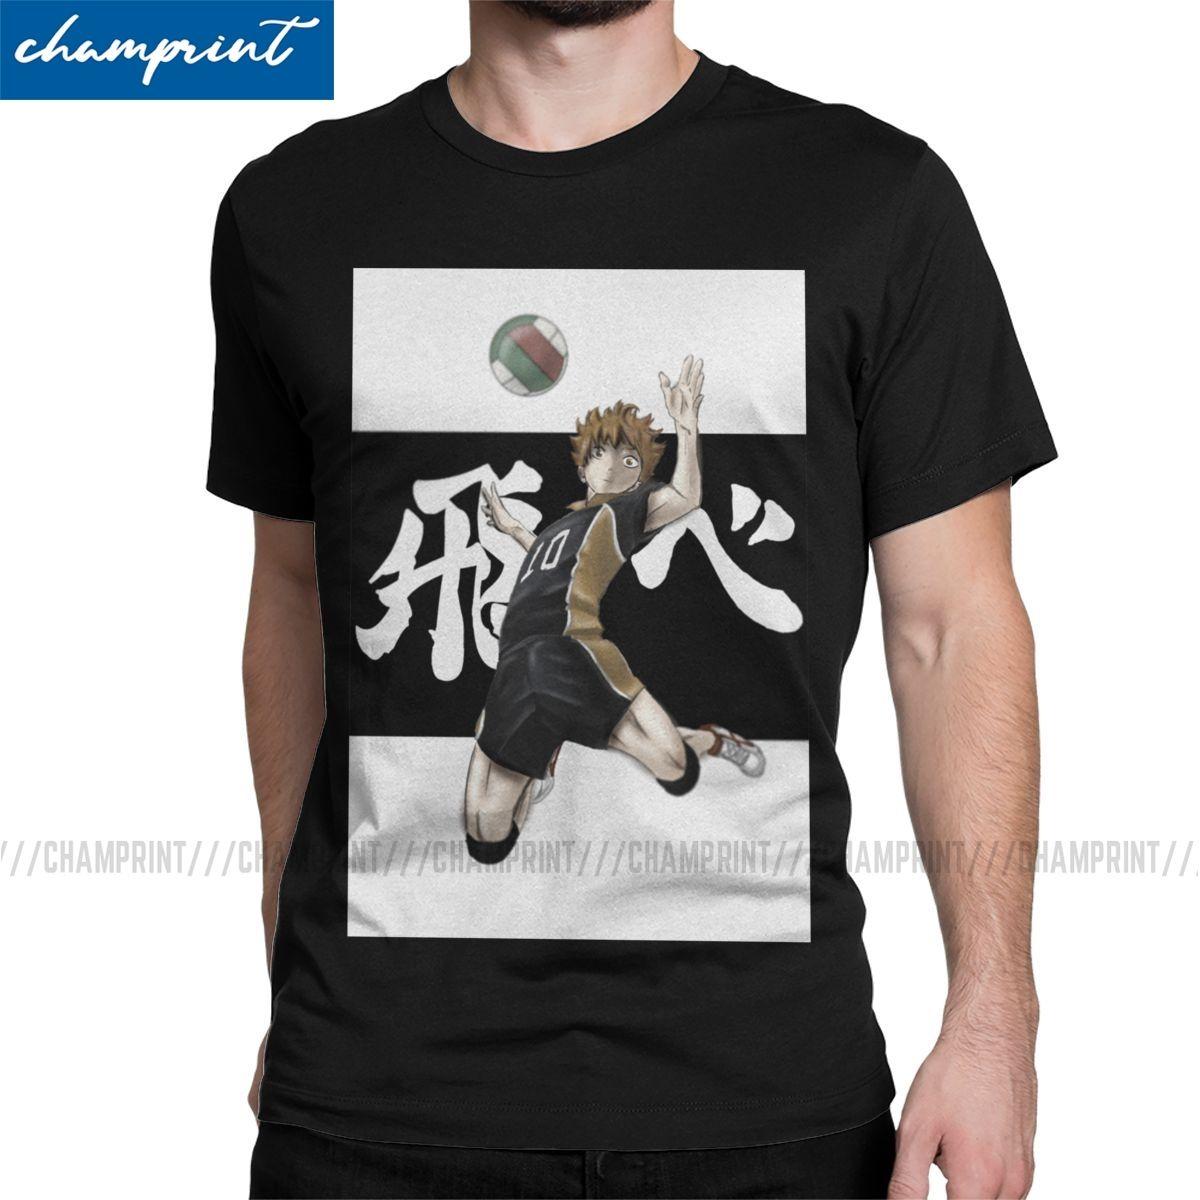 Haikyuu !! Hinata Anime Männer-T-Shirt Bokuto Volleyball Manga Humorous Tees Kurzarmshirt mit runden Ausschnitt T-Shirt Cotton 6XL Tops